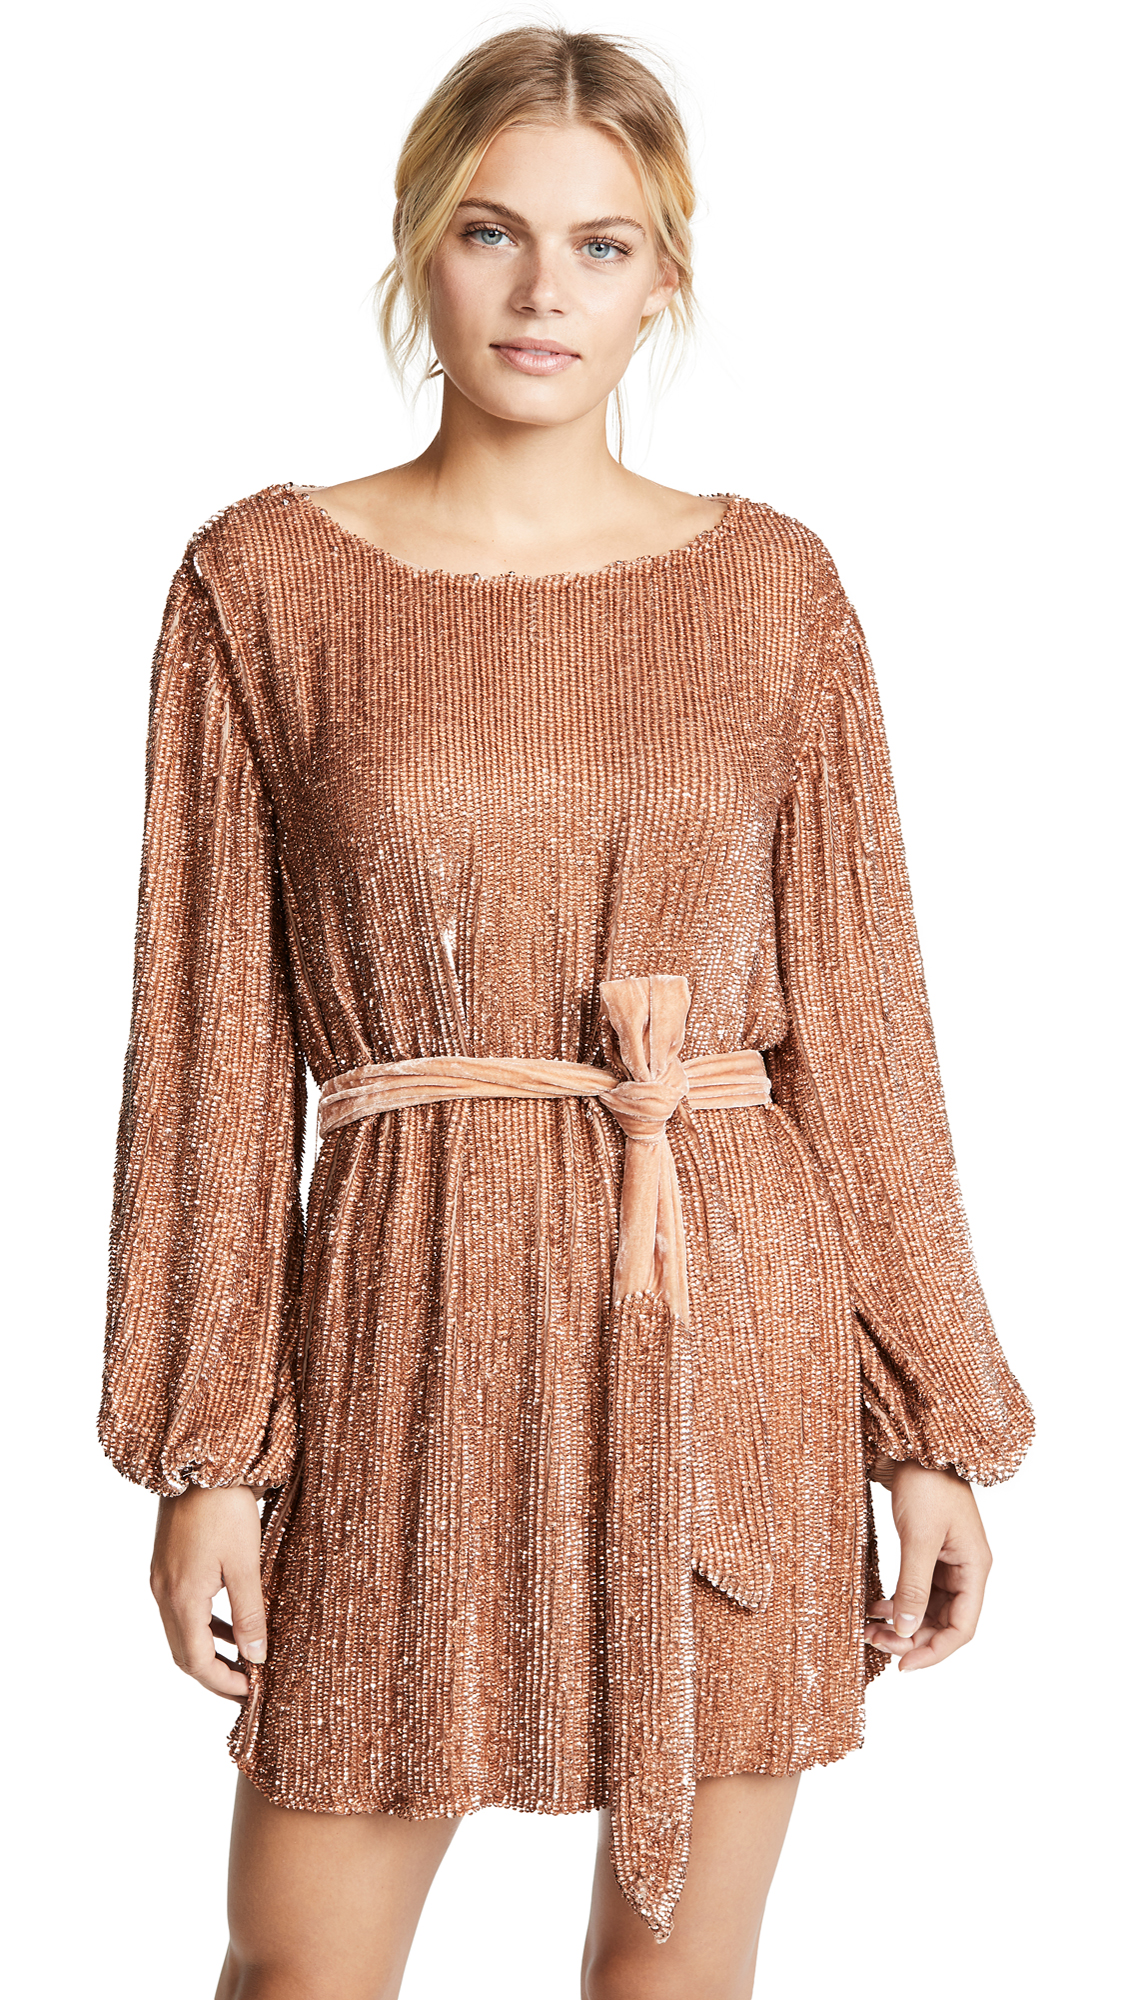 RETROFÉTE Grace Sequin Dress in Bronze